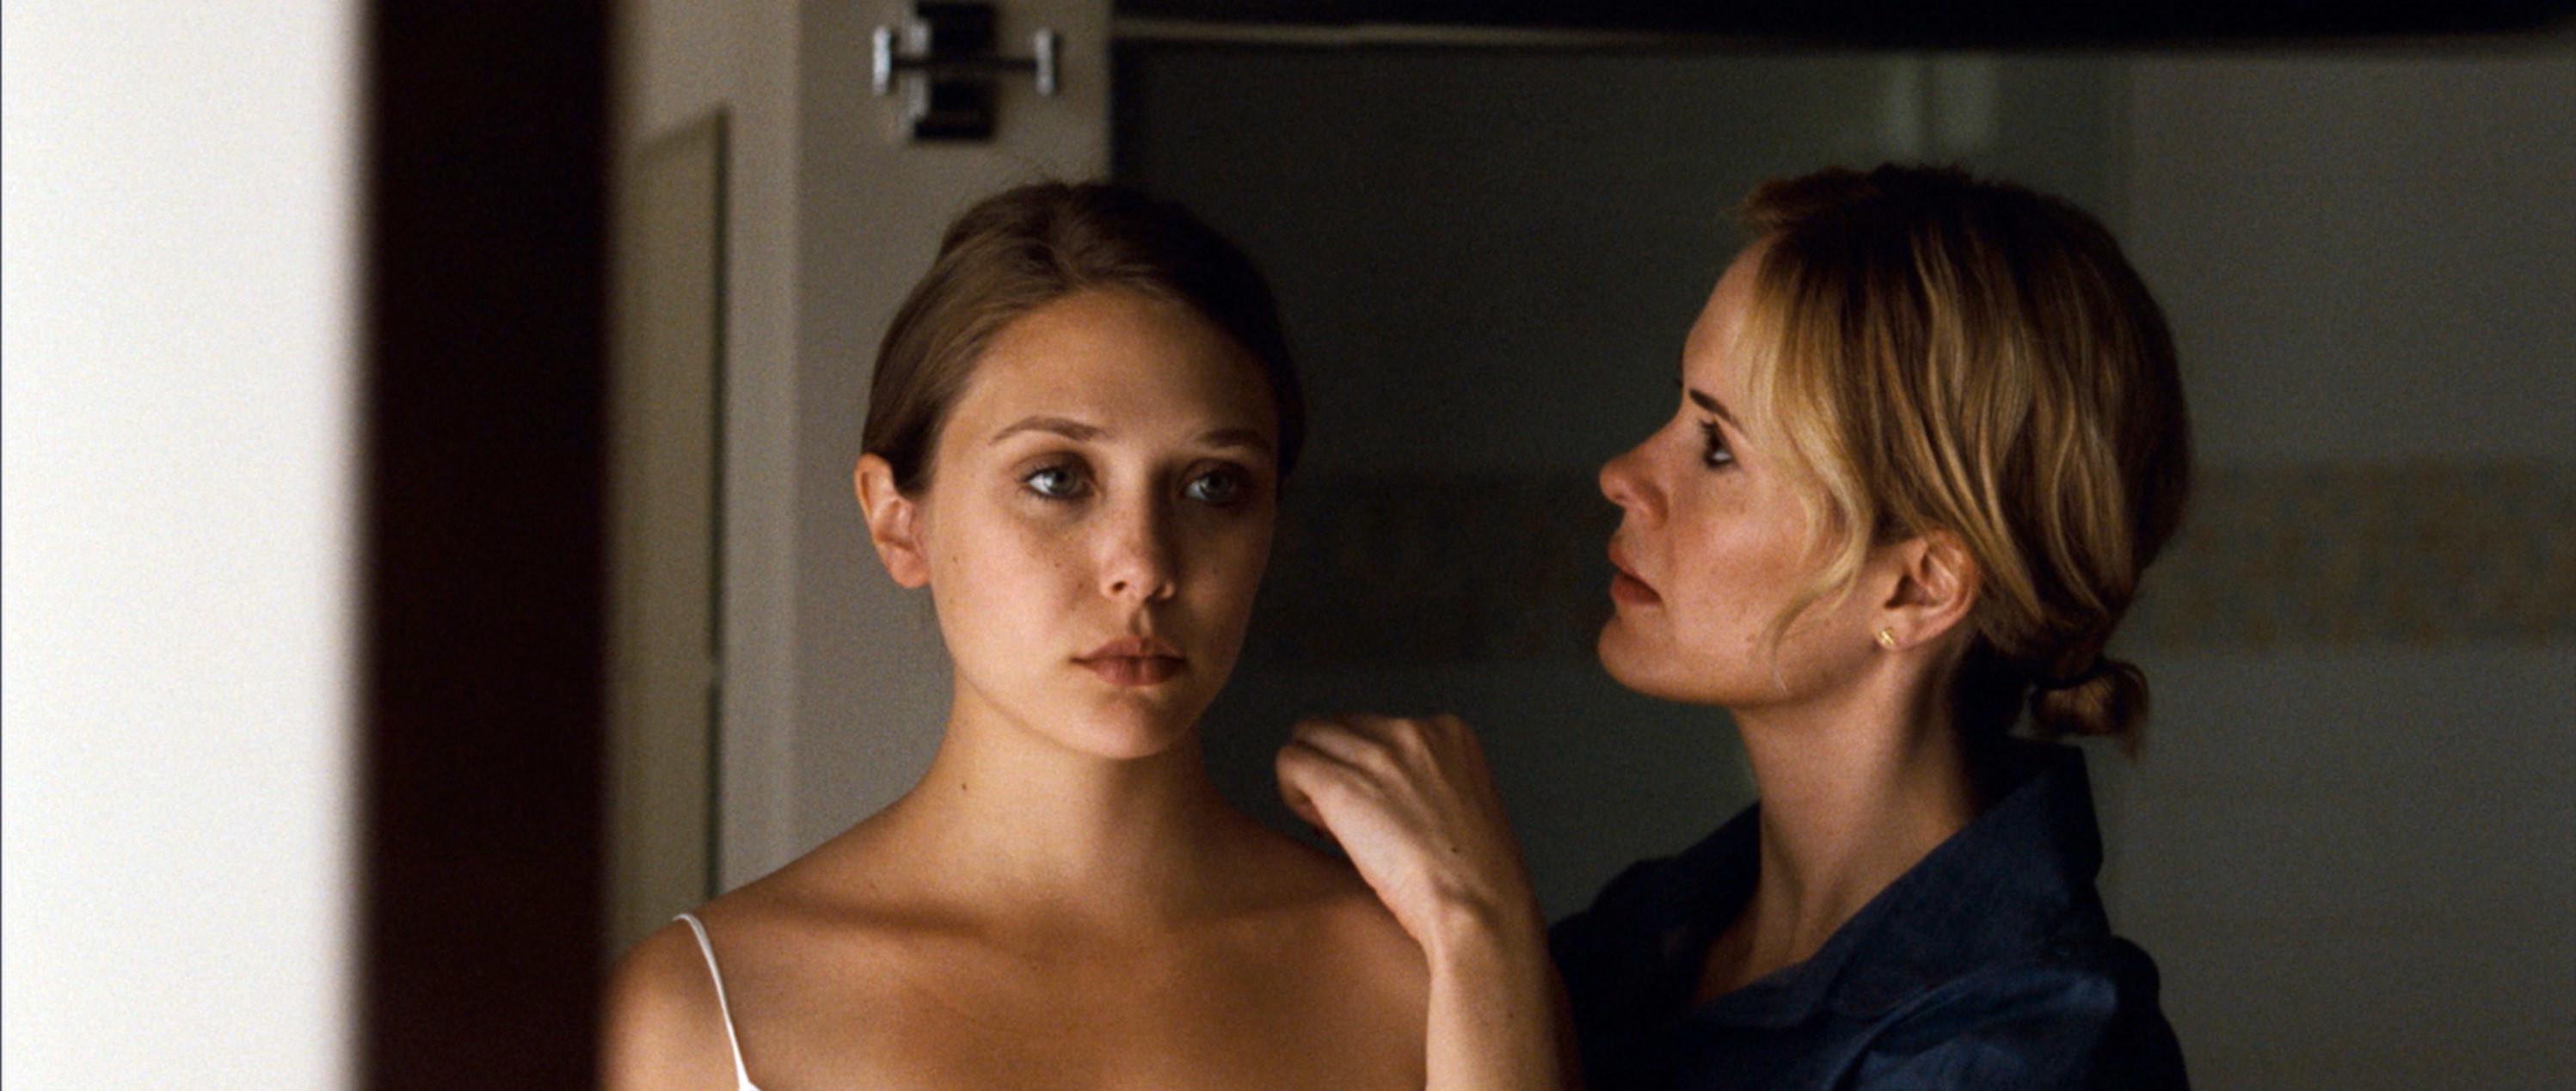 Martha/Marcy/Marlene looking in the mirror in Martha Marcy May Marlene